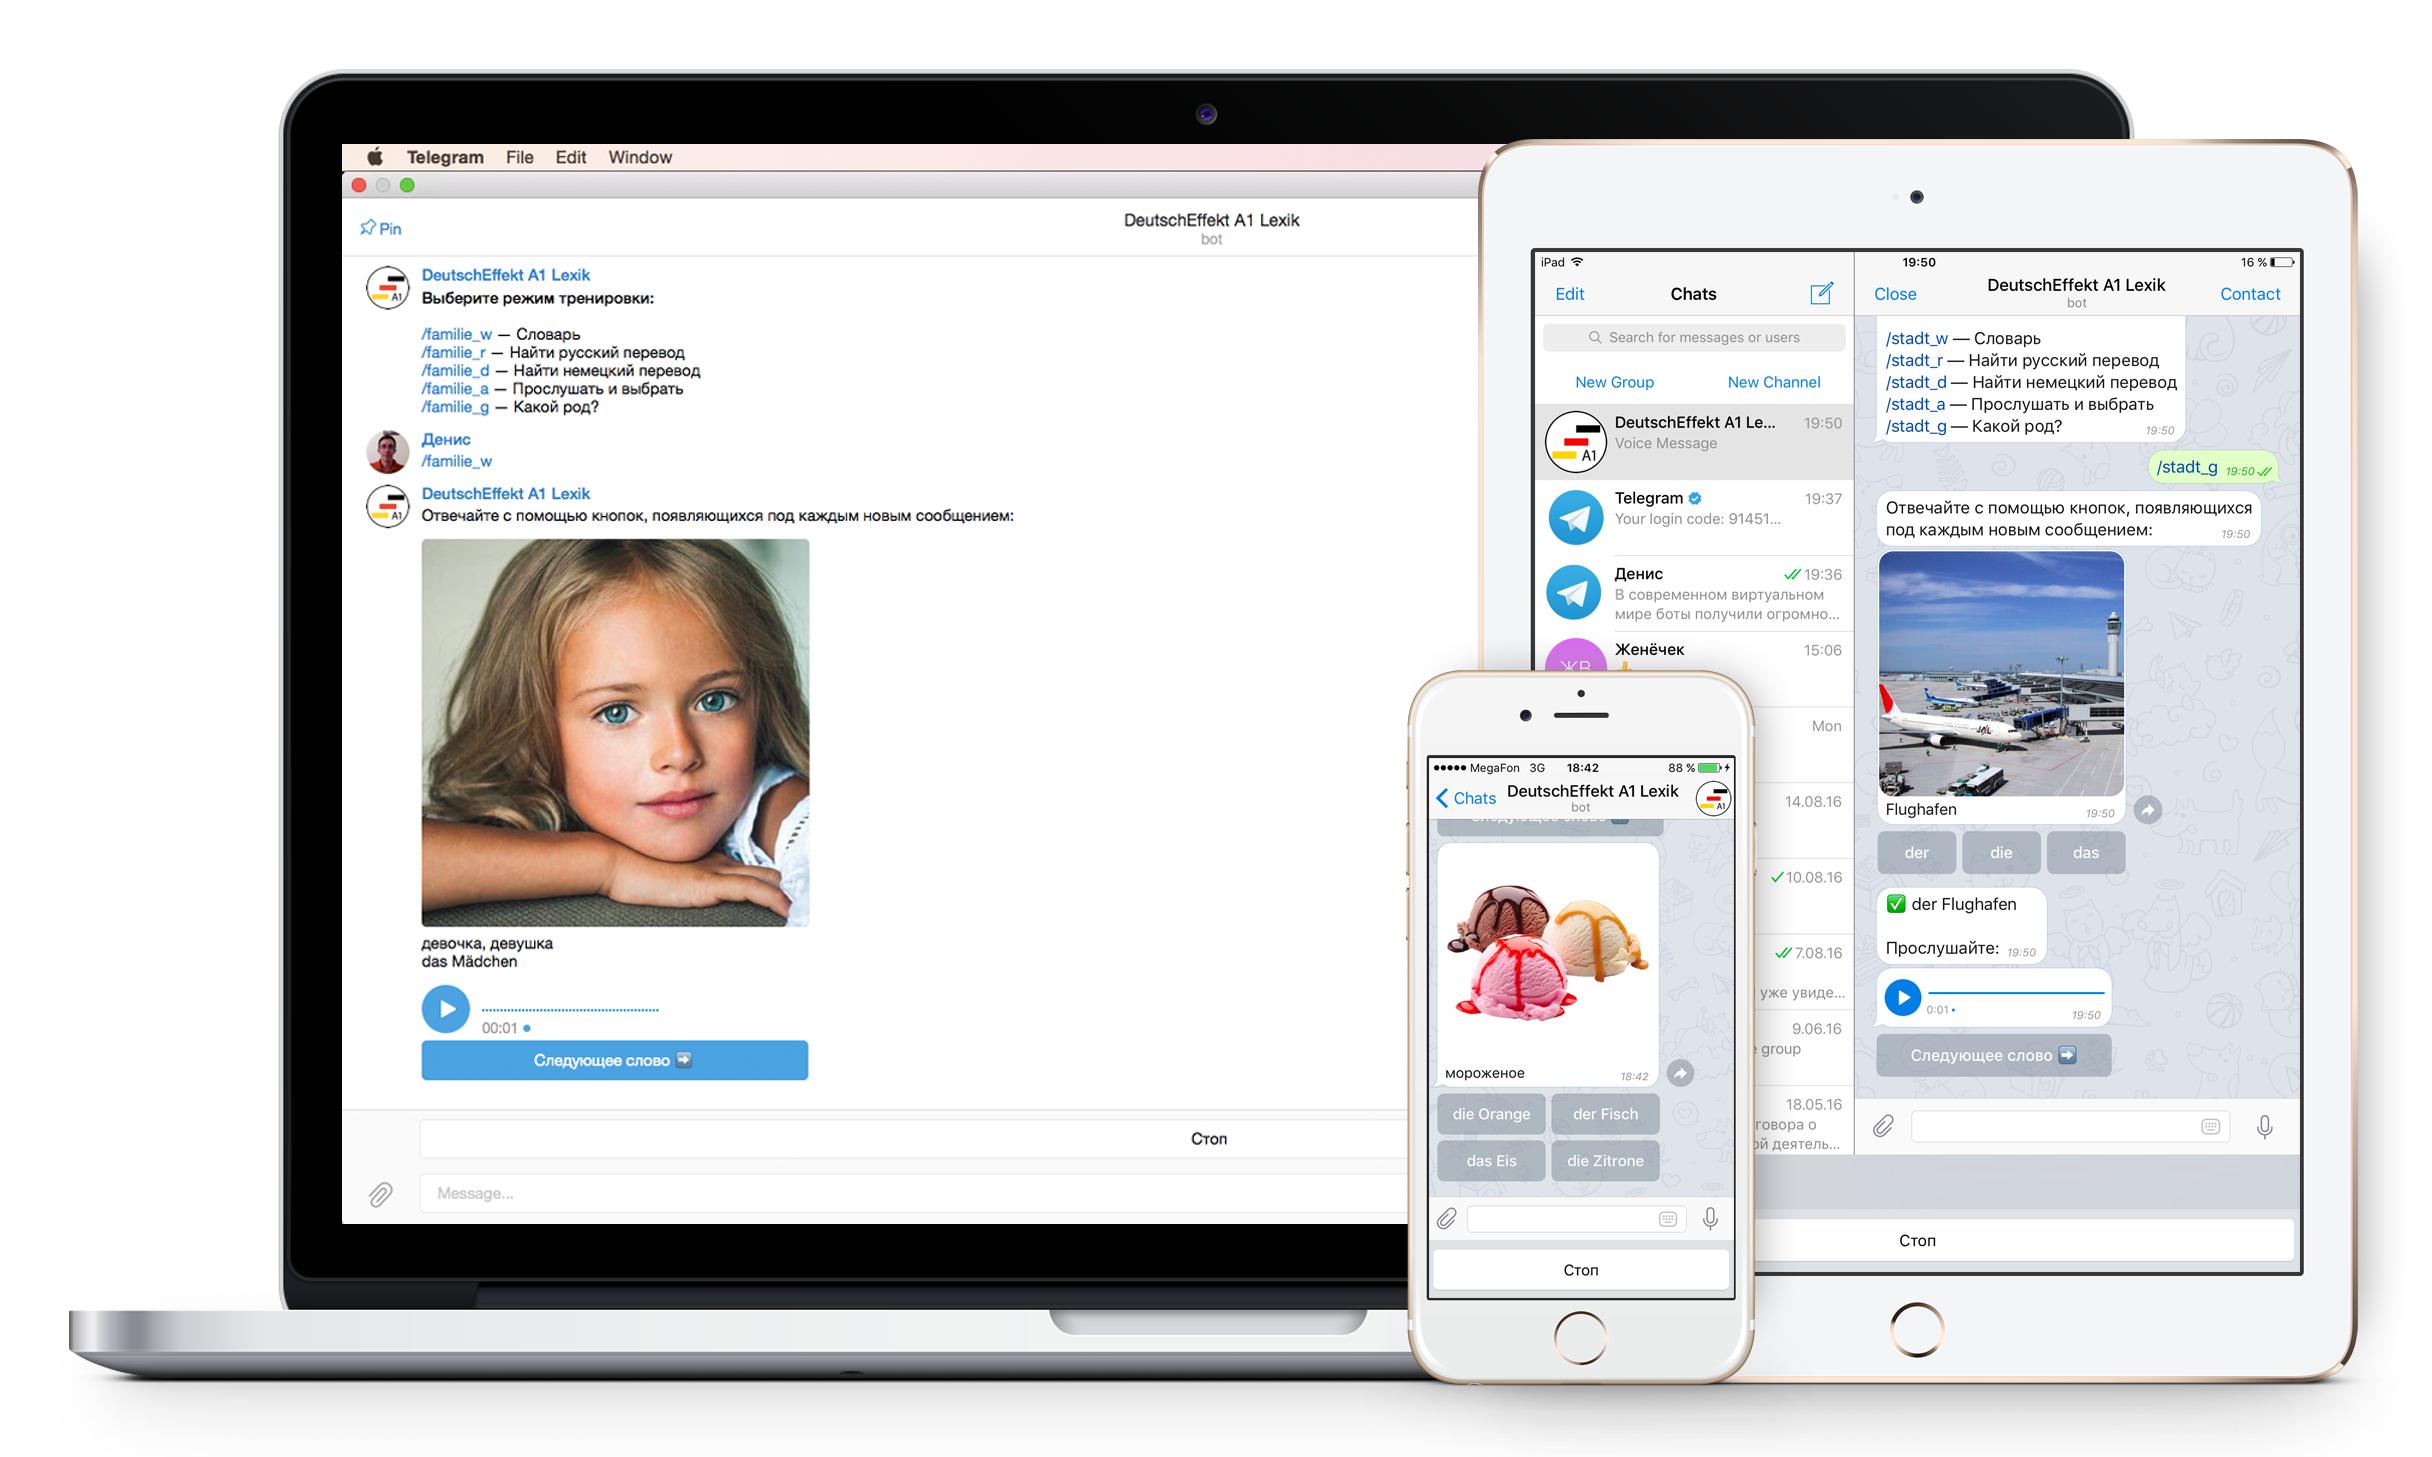 DeutschEffekt Lexik Bot for Telegram